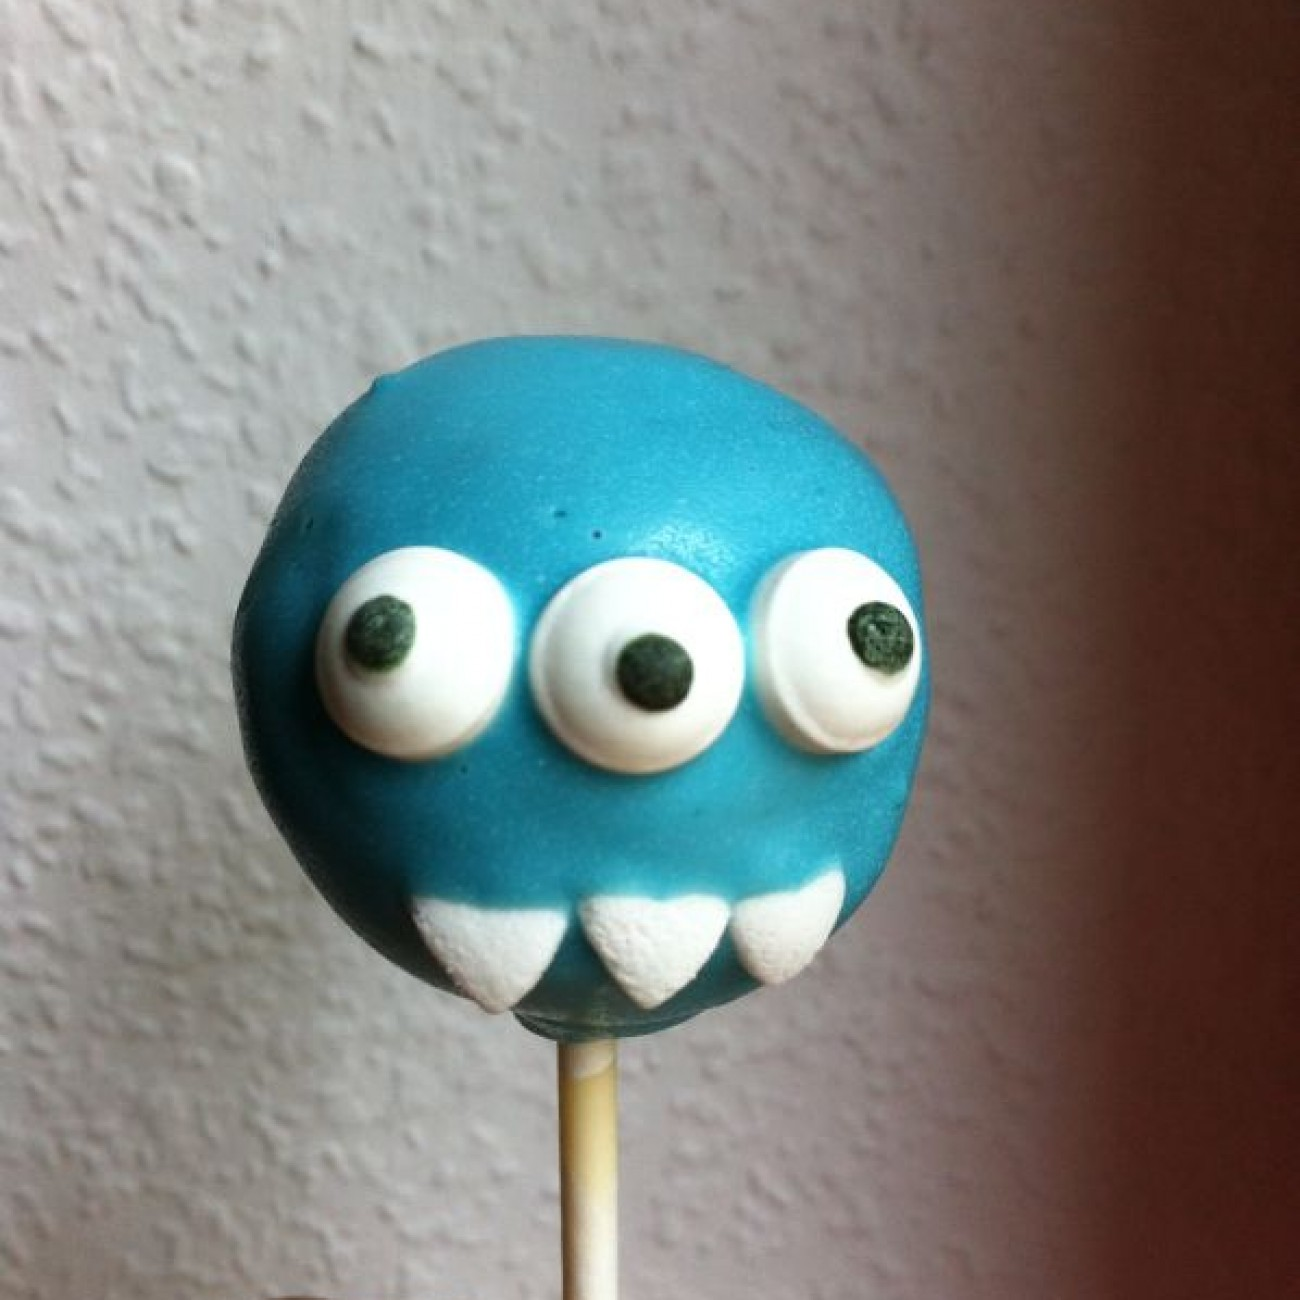 Kuchenlollis (Cakepops)